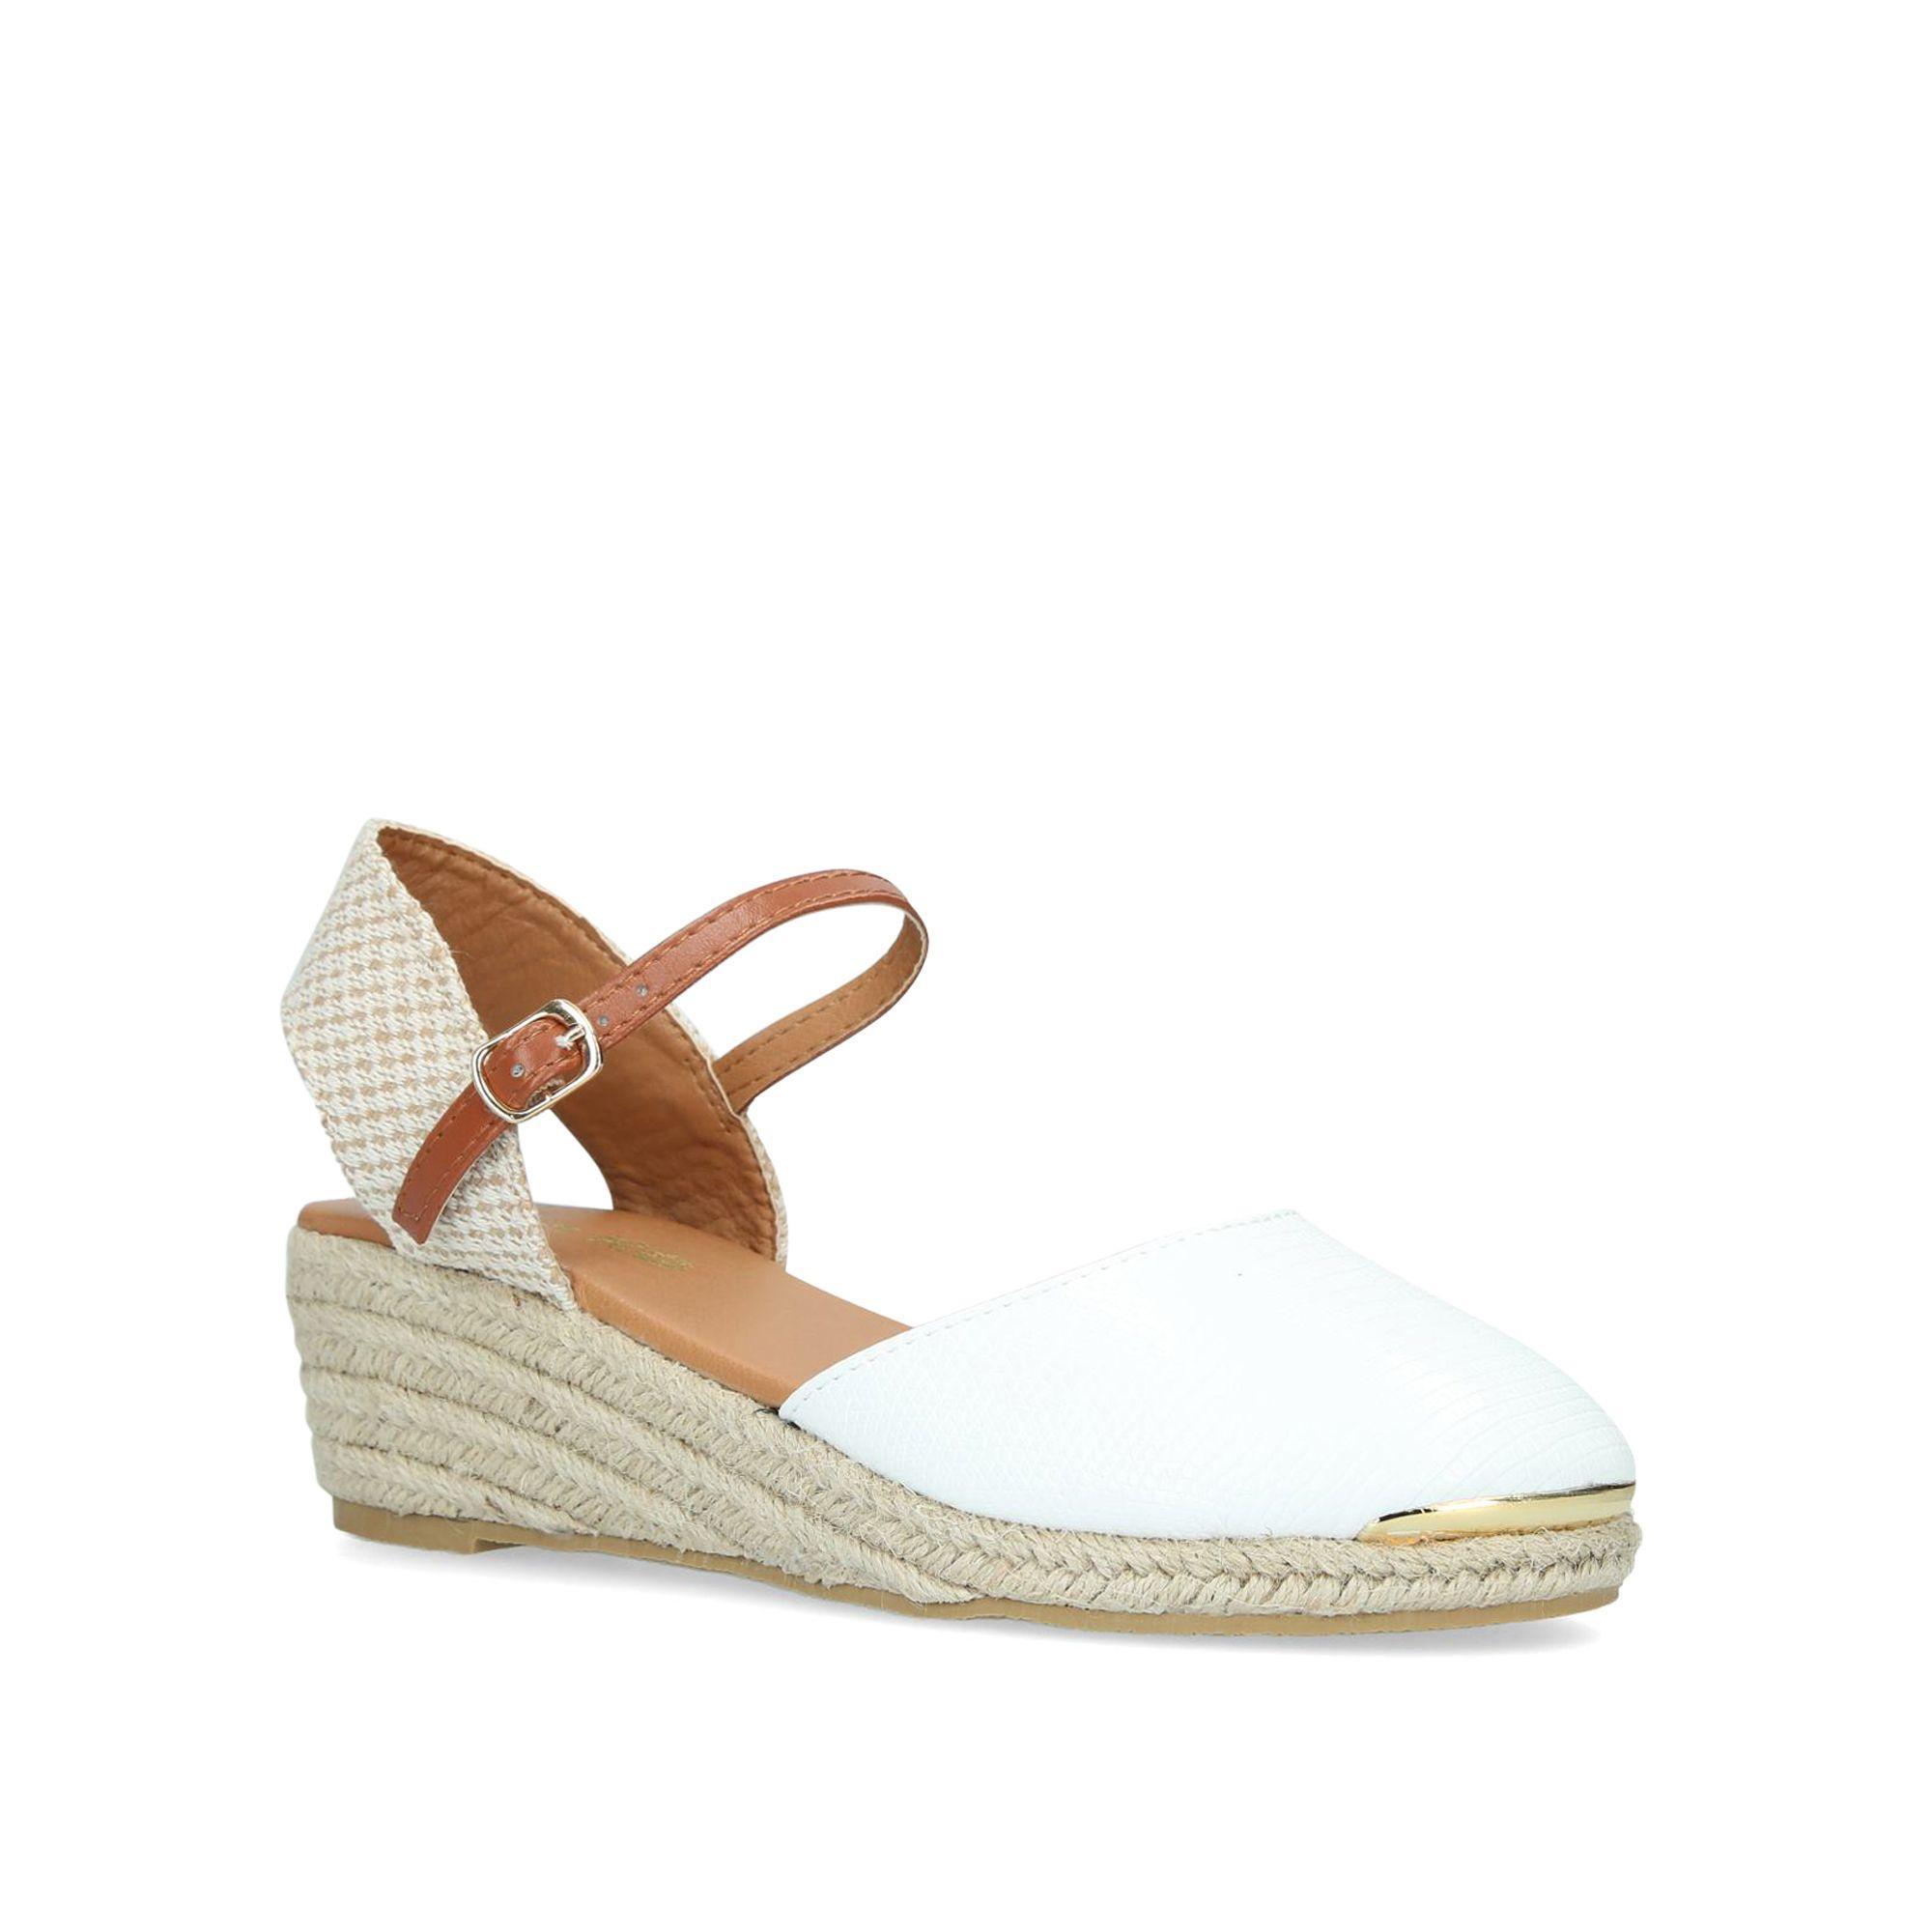 9b34394786c Women's White 'lea' Espadrille Wedge Sandals